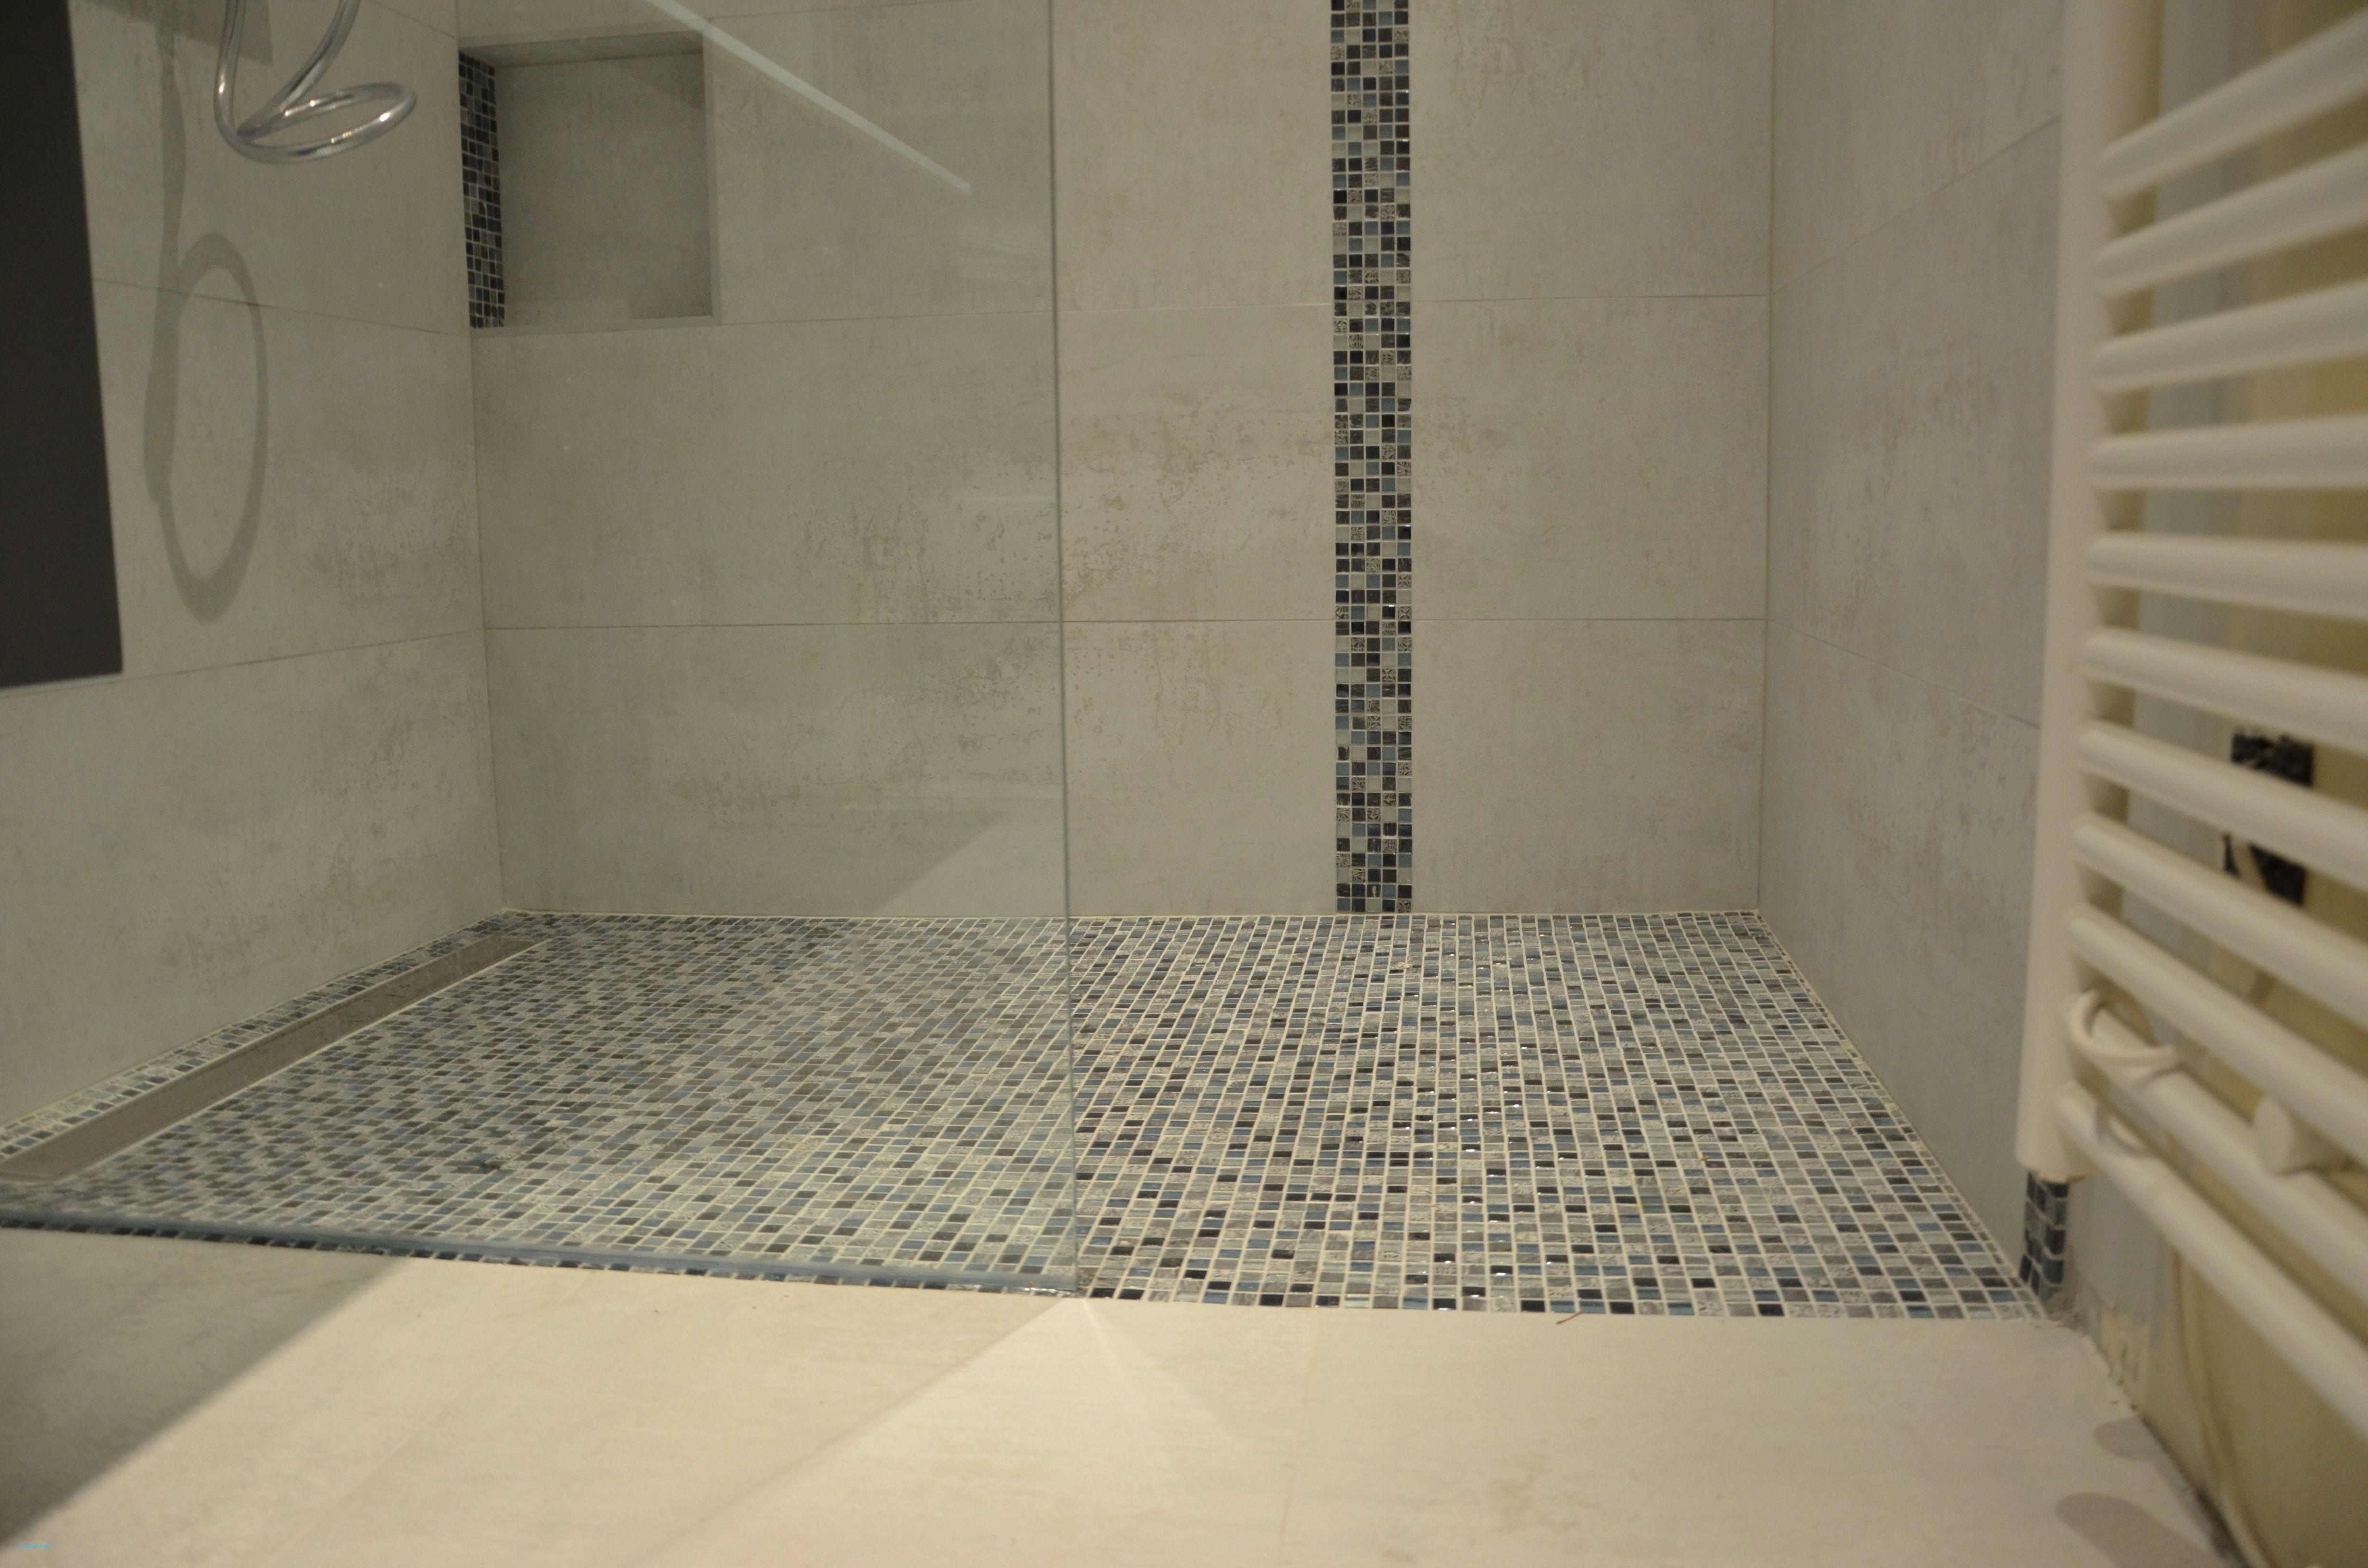 prix peinture carrelage salle de bain lgant peinture pour carrelage sol cuisine simple design peinture pour - Peinture Carrelage Salle De Bain Prix